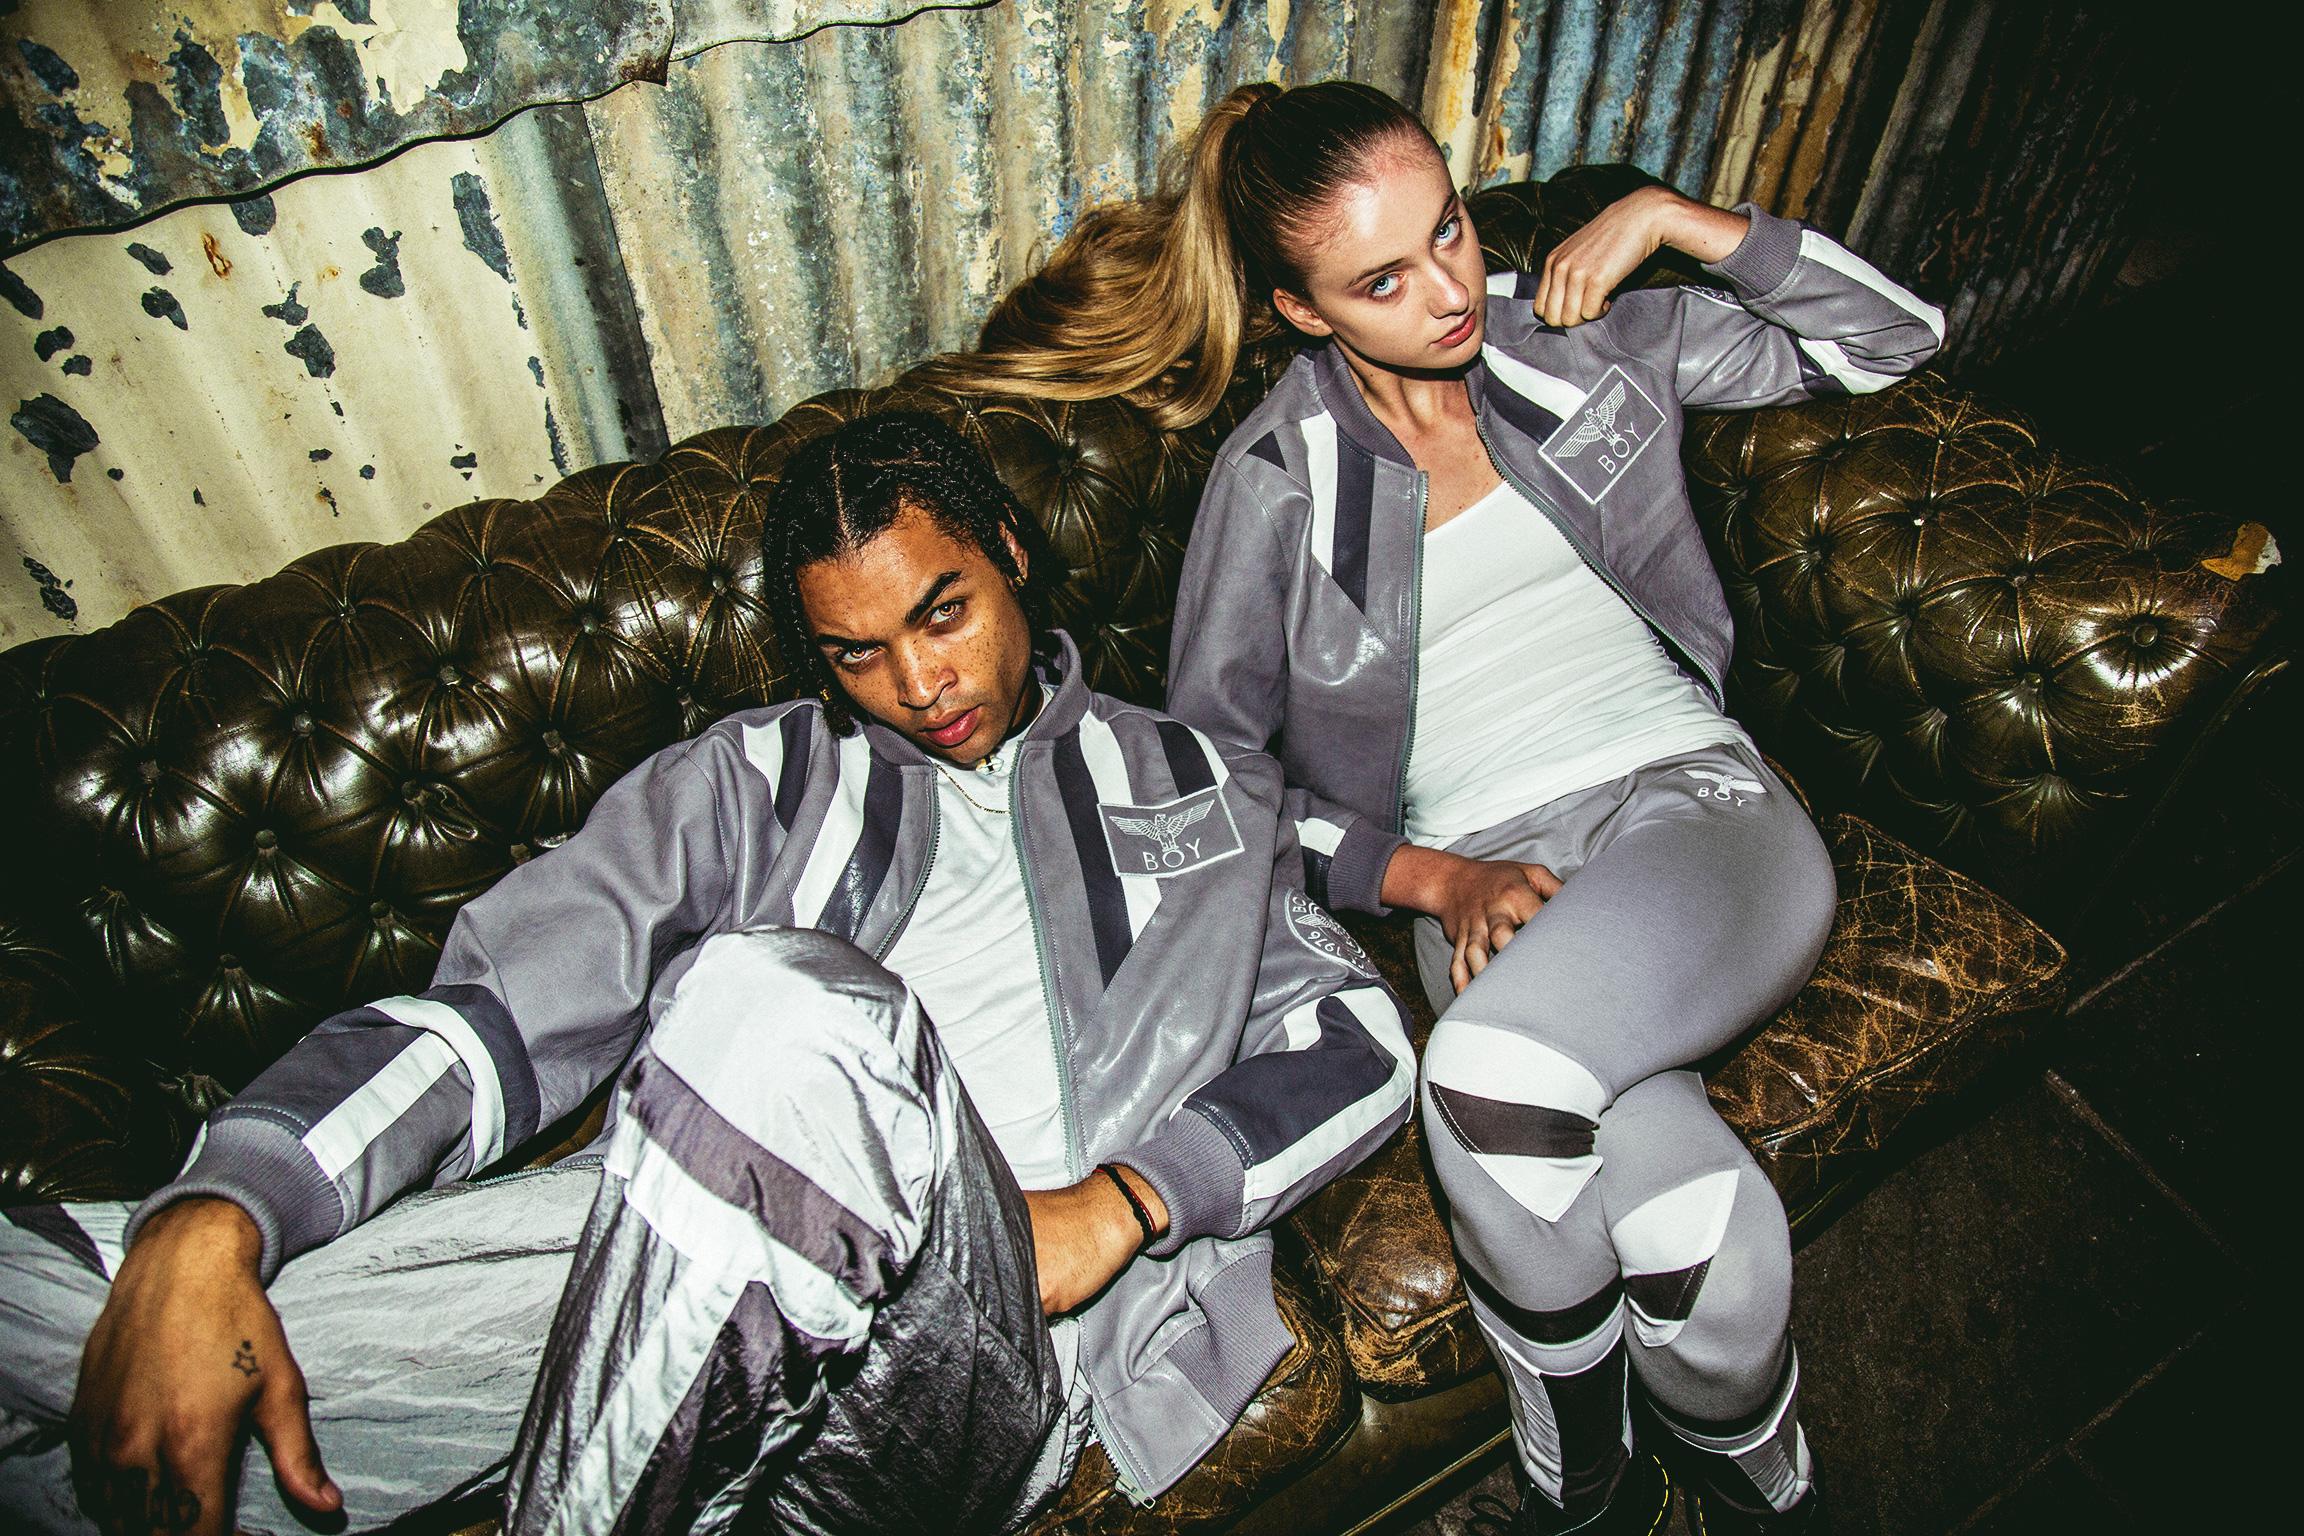 BOY LONDON Retro-Inspired Sportswear Collection